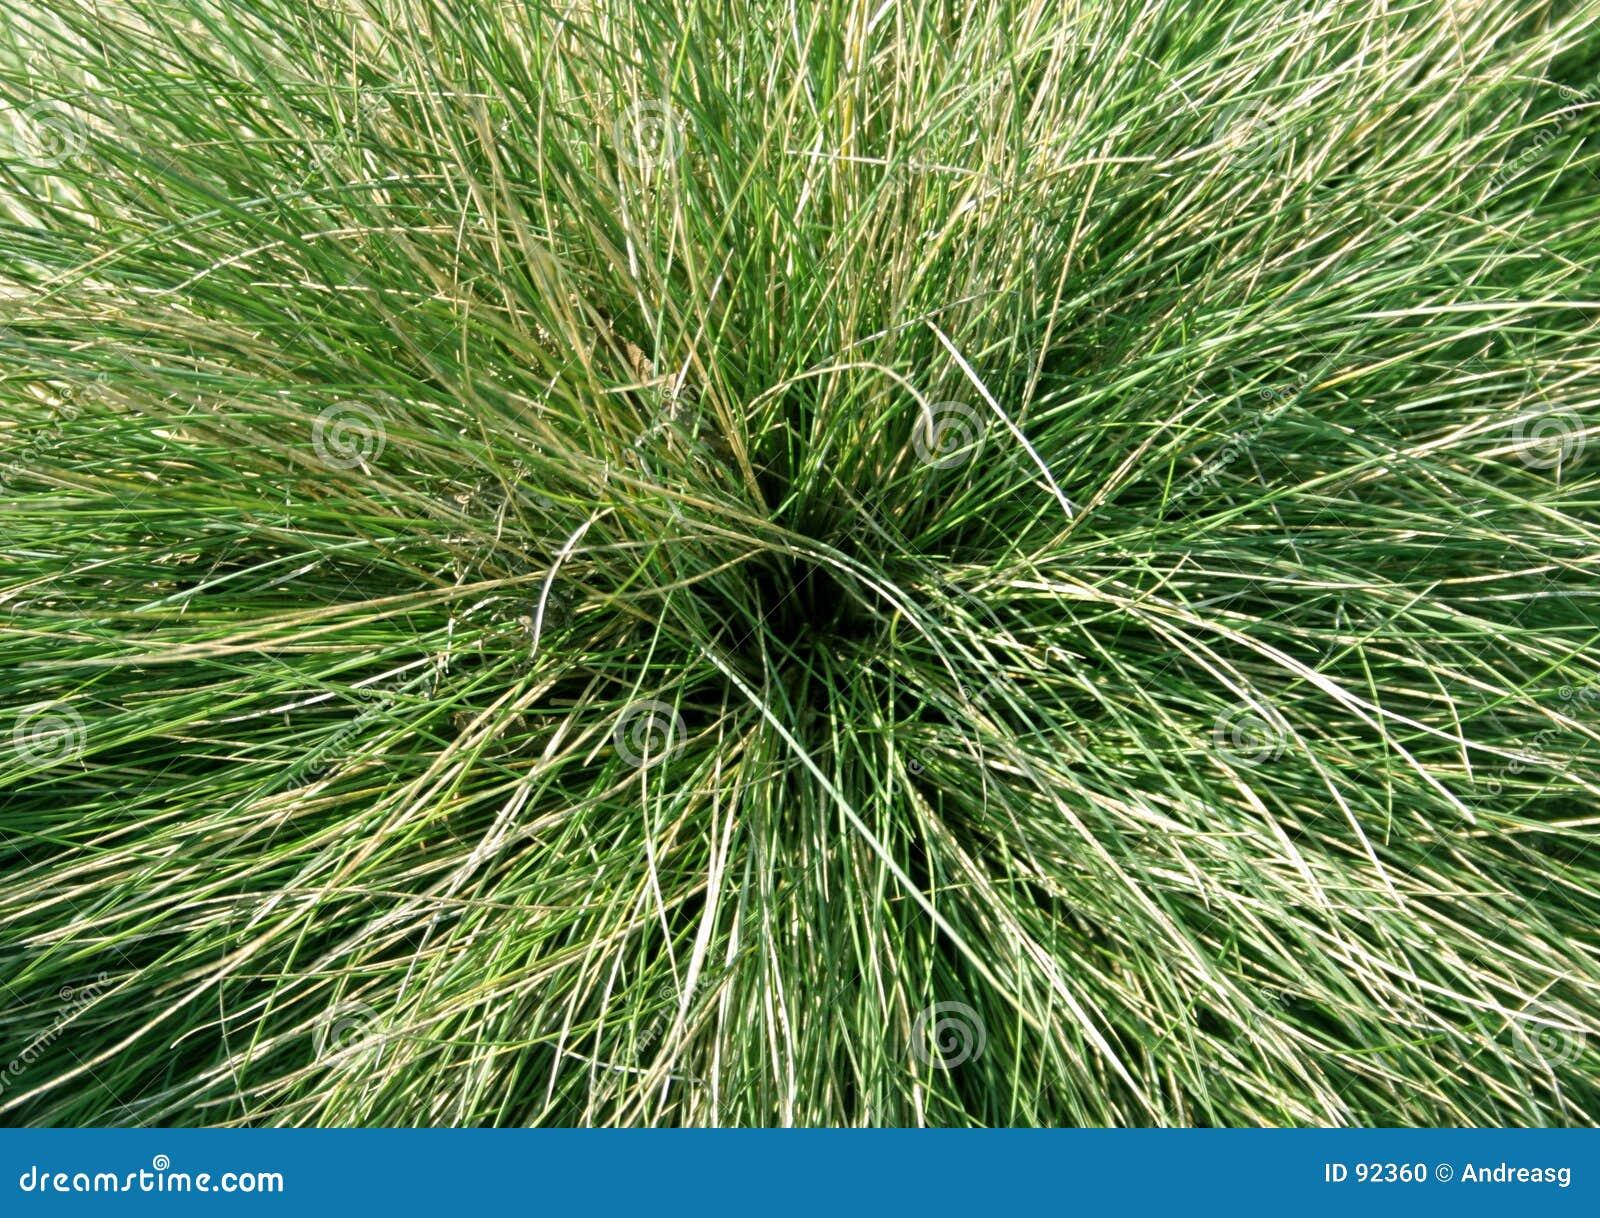 Ornamental grass stock photo image 92360 for Green ornamental grass